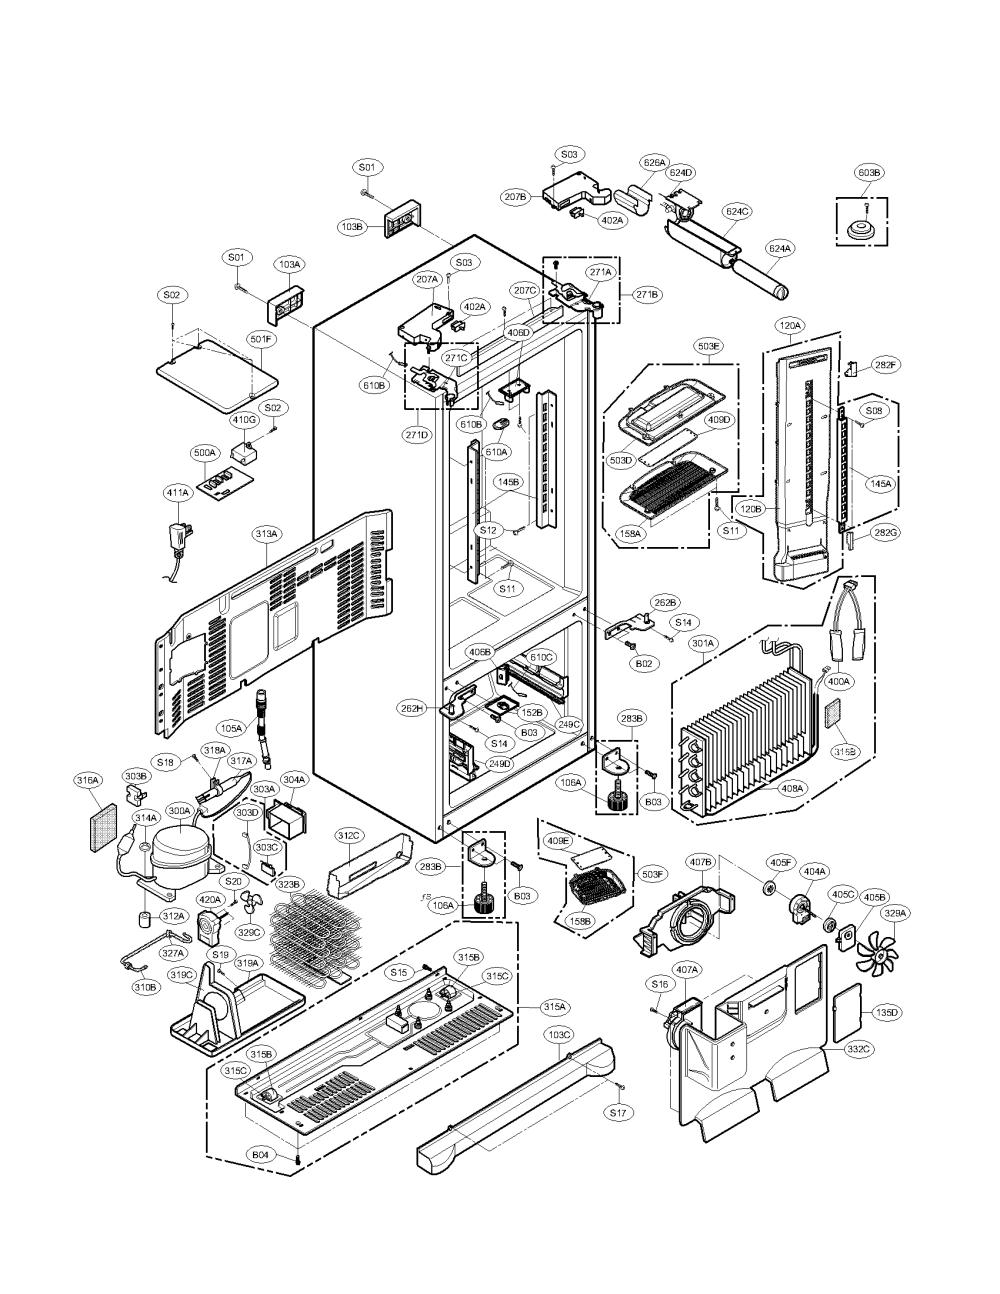 medium resolution of kenmore refrigerator schematic diagram wiring diagram general compressor wiring diagram kenmore refrigerator